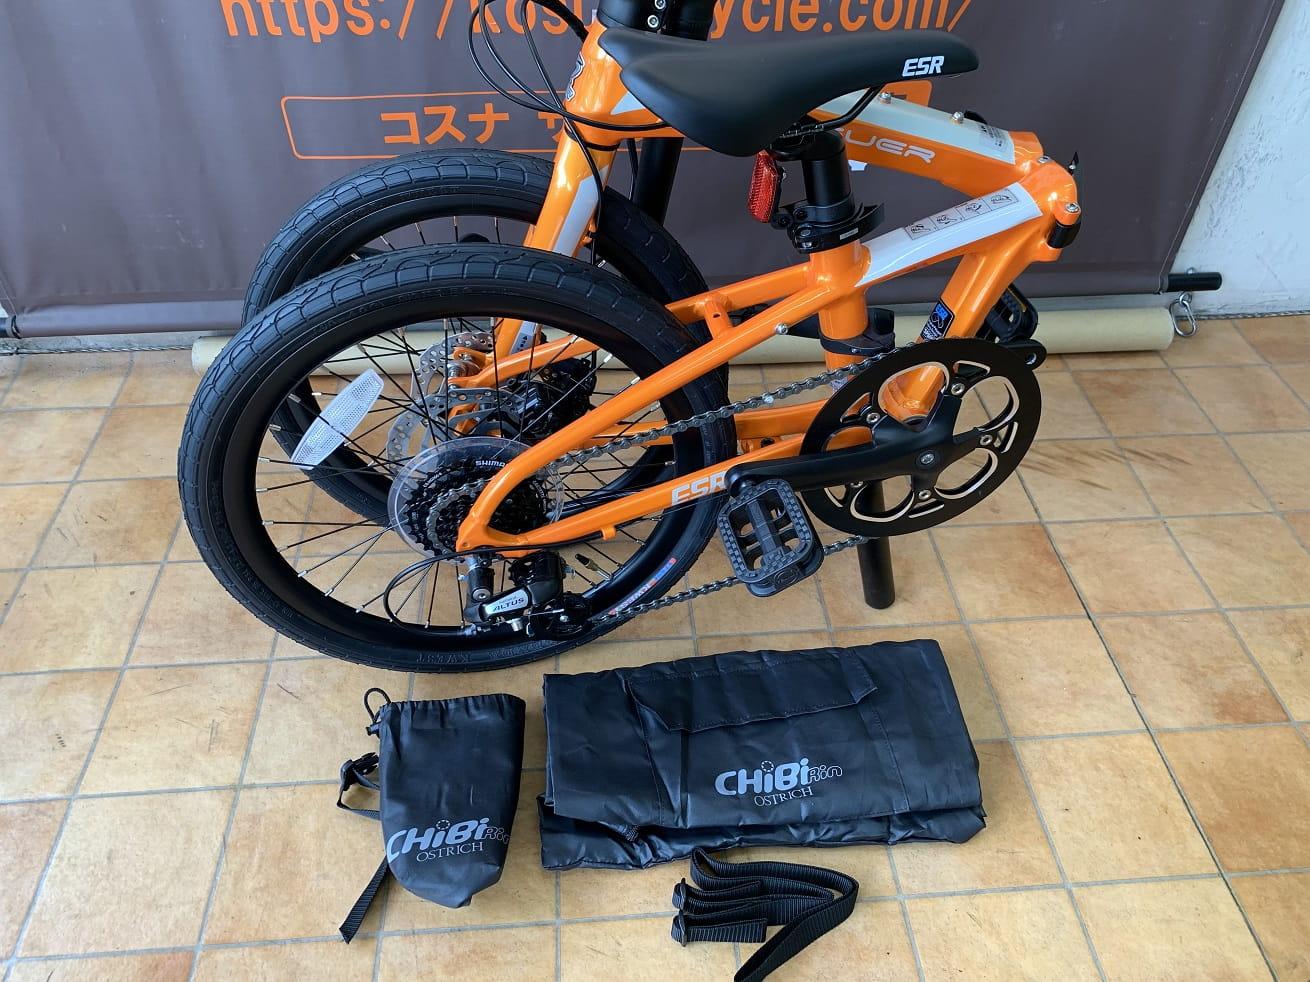 ESRパーサー折り畳み自転車とオーストリッチ小径折り畳み自転車用輪行袋 ちび輪バッグ